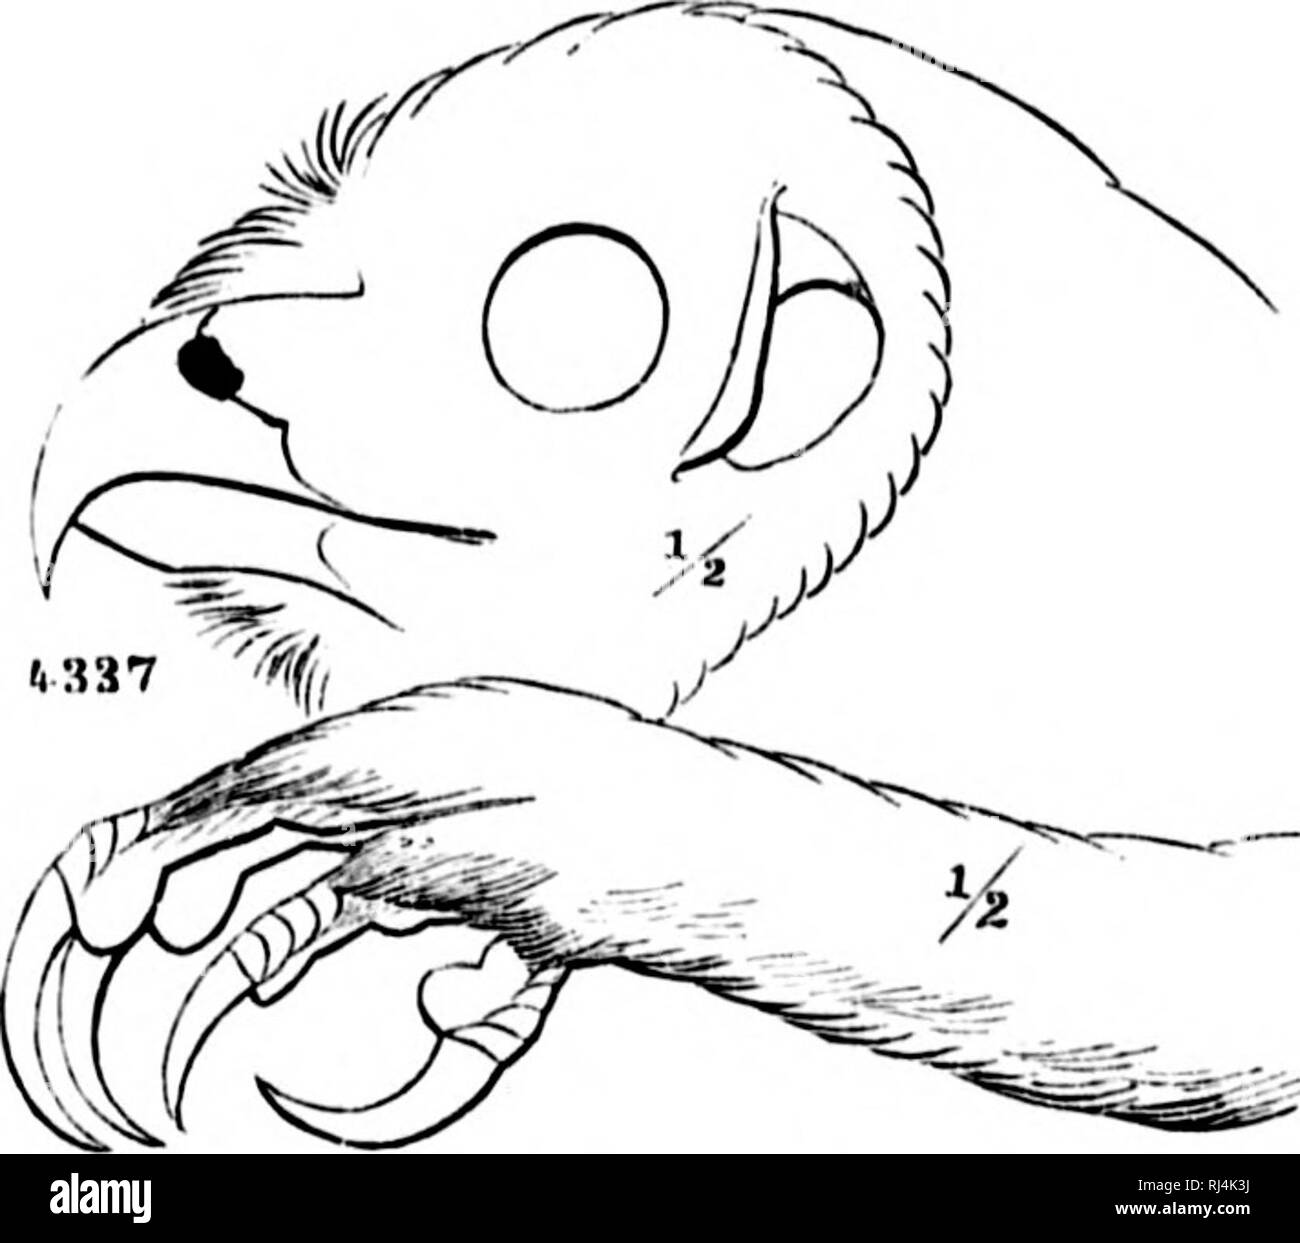 ". A history of North American birds [microform] : land birds. Birds; Ornithology; Oiseaux; Ornithologie. Syrniinn iiibiilostim. GeNI'M SYRNIUM, SAVIfJNY. Si/niiioii, Savionv, iVut. Hist. KKypt, I, 112; isno. (Tyi>p, . i,.f nhico, I"") SivtiKjilij; SwAiNN,, Cliissir. IS. II, 1837, 1>. 21tt. (Type, Strix ciiterra, (i.MKi,.) ? Ciivalid, Wa(ii,. Isis, 1.S31. (Tvpc, SIriv hithuh, Dauii.) 1 J'idsiili-ii; Kaii', 184!I. {SirU loi-ijiiiilds, Daiii.) fiKN. CiiAii. Size varyiiif,' I'roin iiir(liiiiii to vciy liir^c. No cnr-tu(ts. Head very Inrjrp, the cyoH uoiiipanitivi'ly sniall. Four to six oiitc - Stock Image"